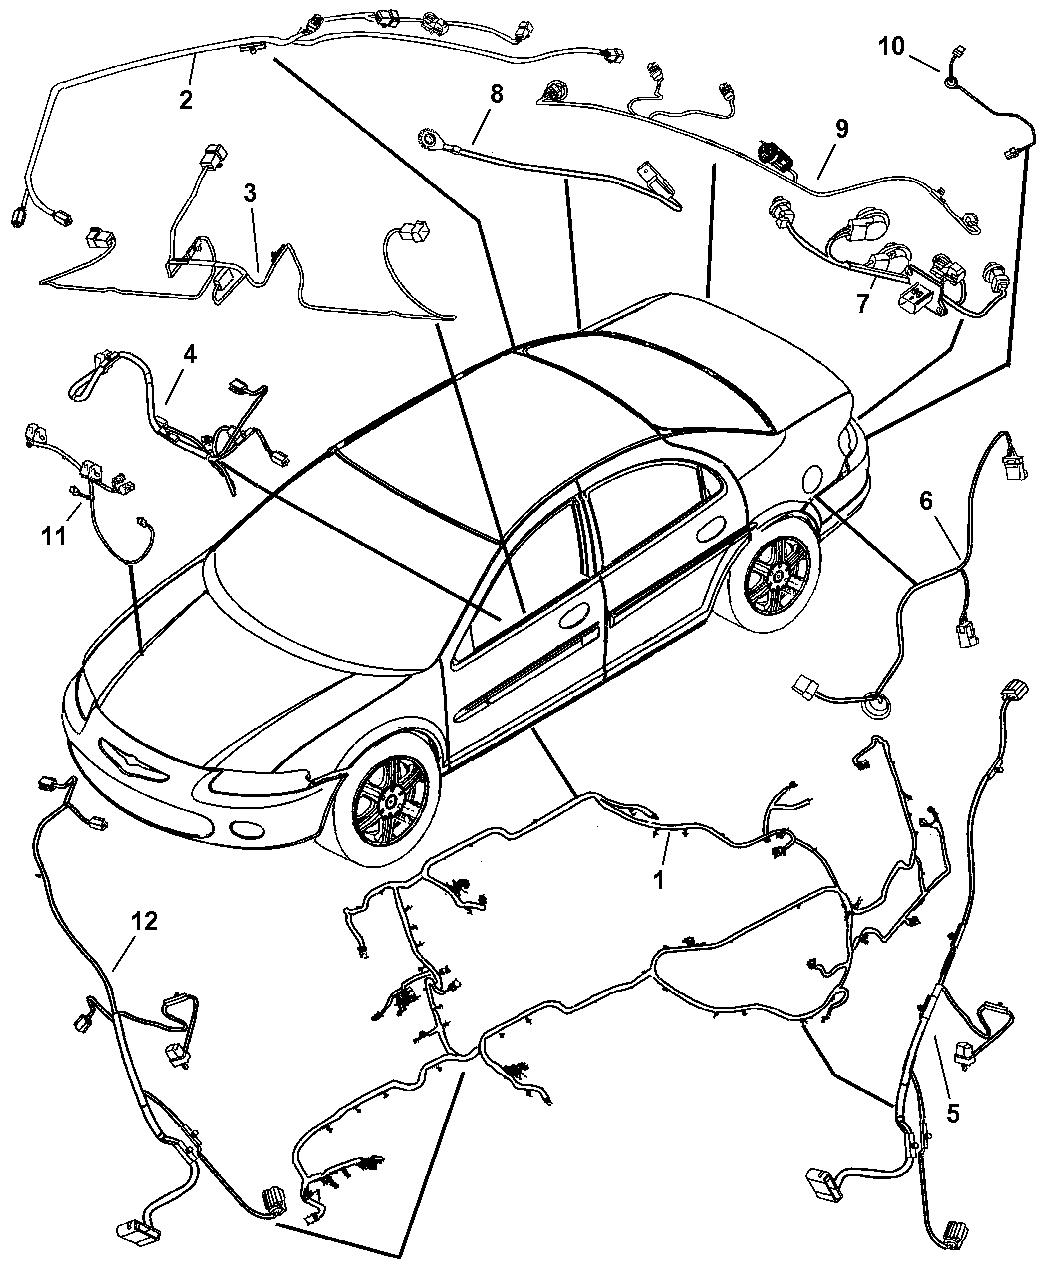 5101959aa